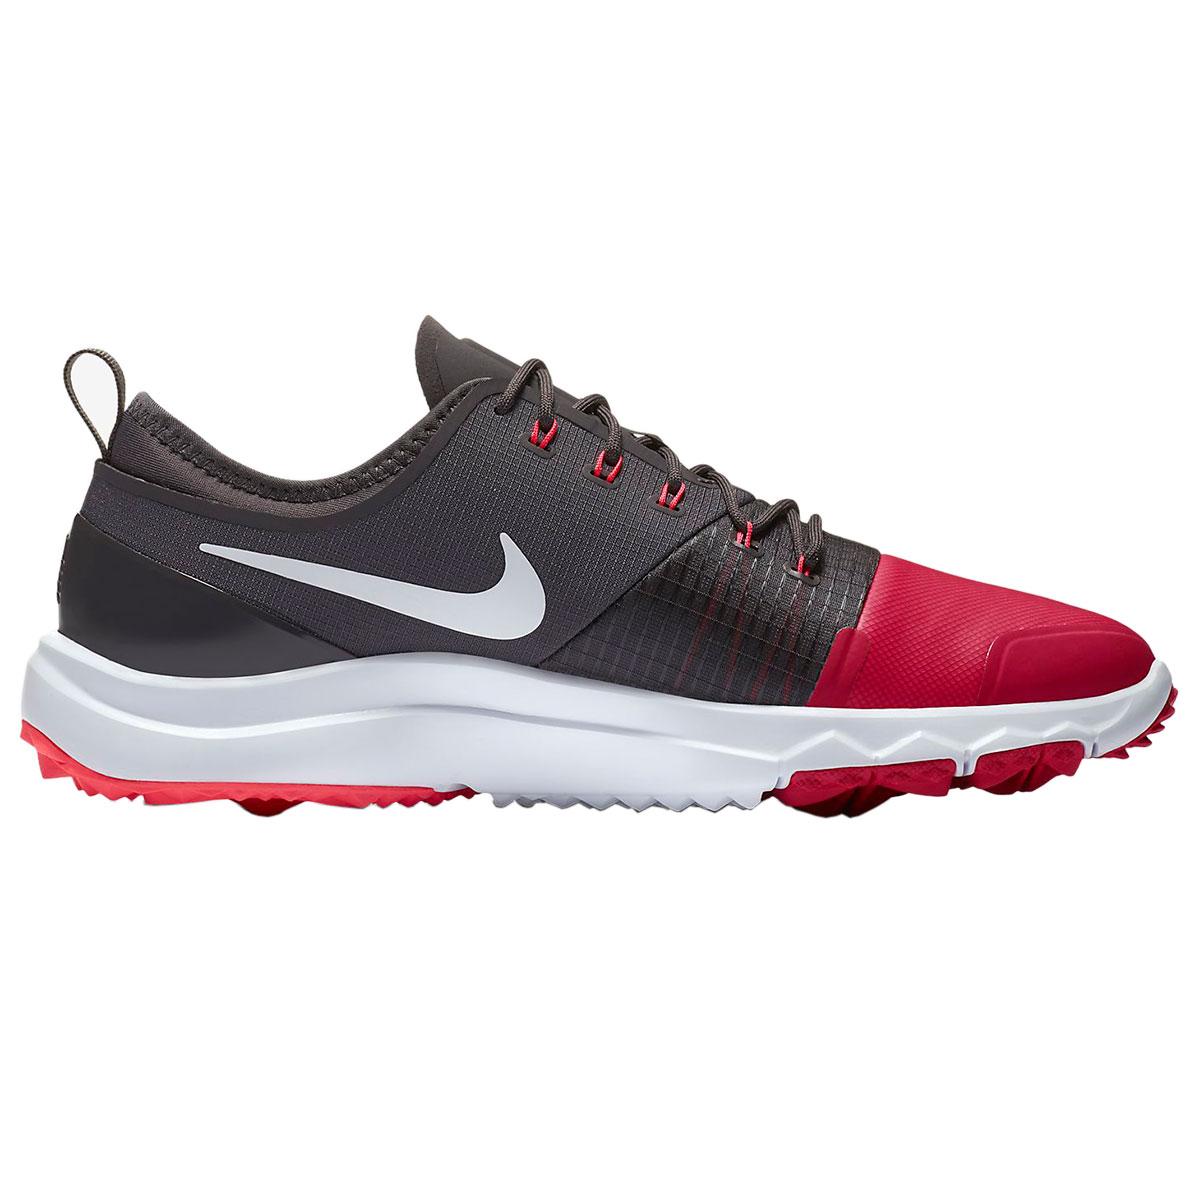 Nunudes Co Uk Fi: Nike Golf FI Impact 3 Ladies Shoes From American Golf